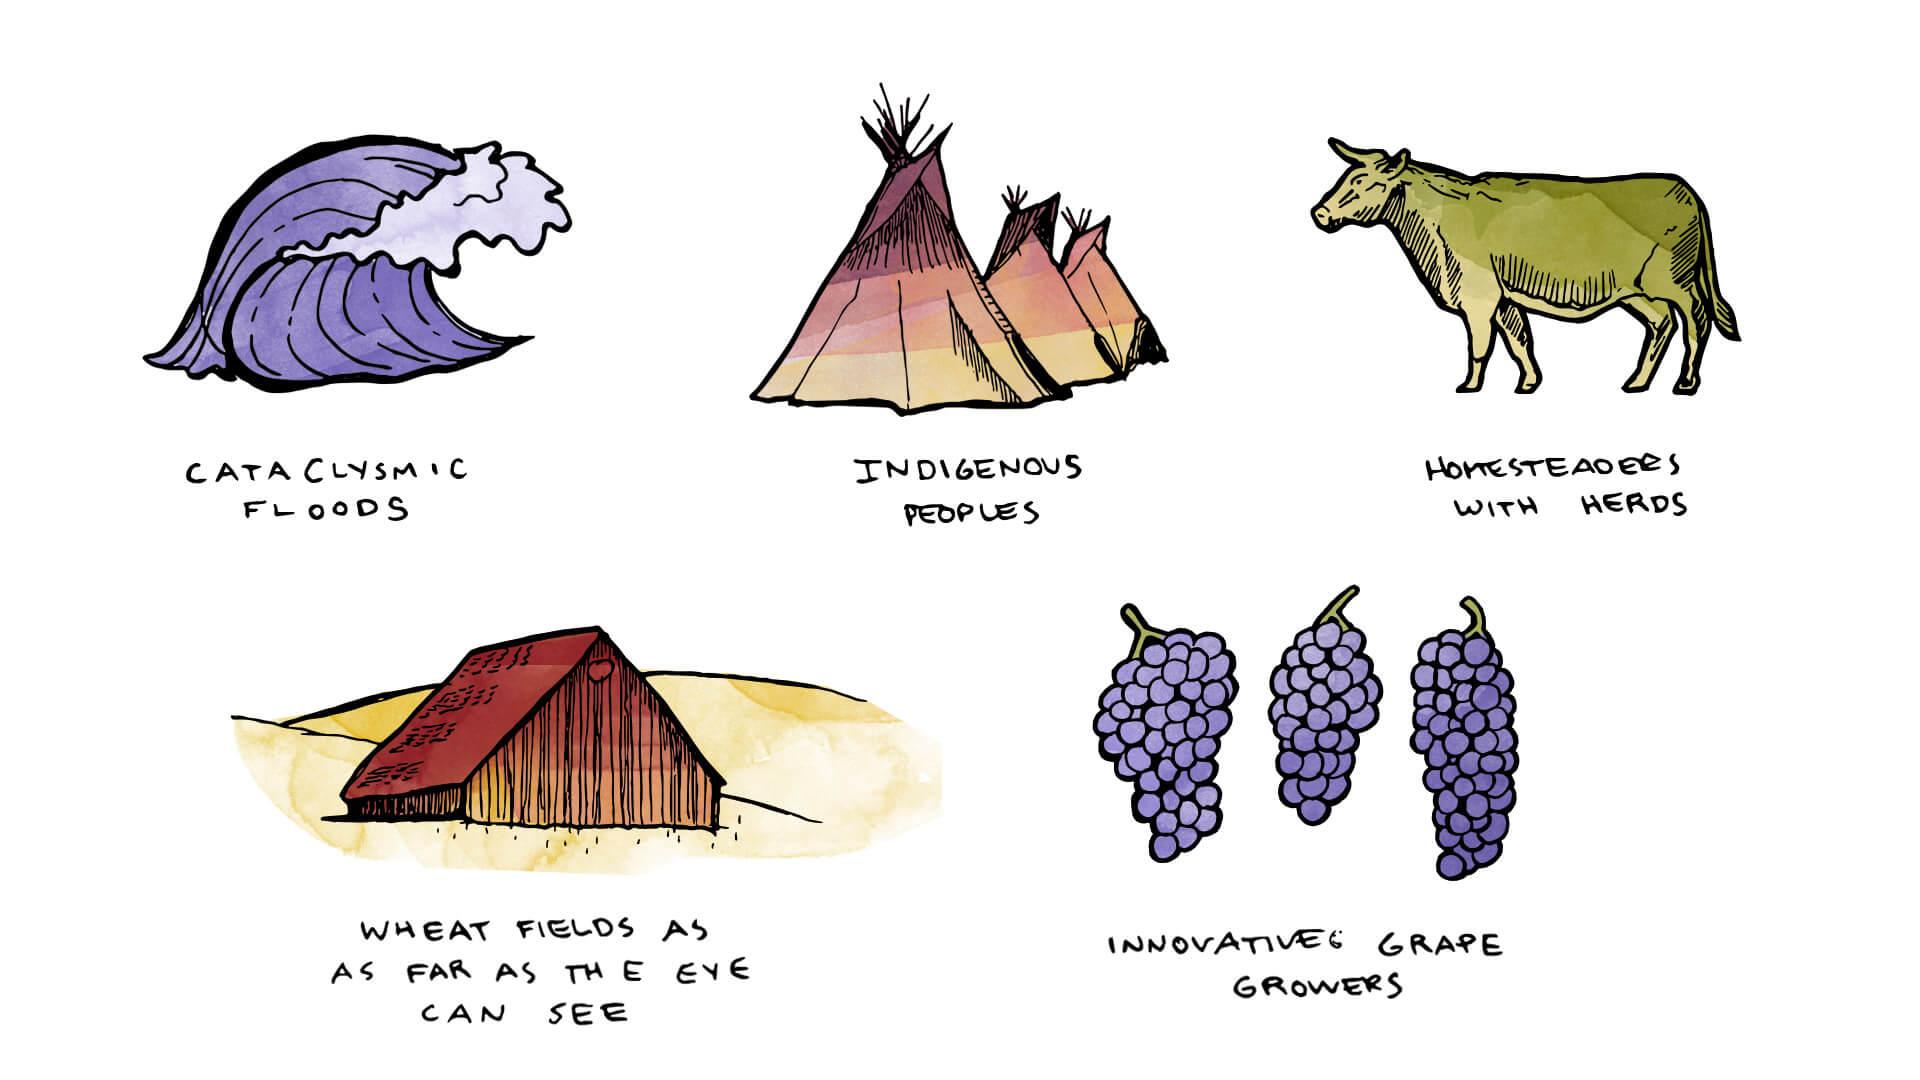 walla-walla-valley-history-premise-timeline-winefolly